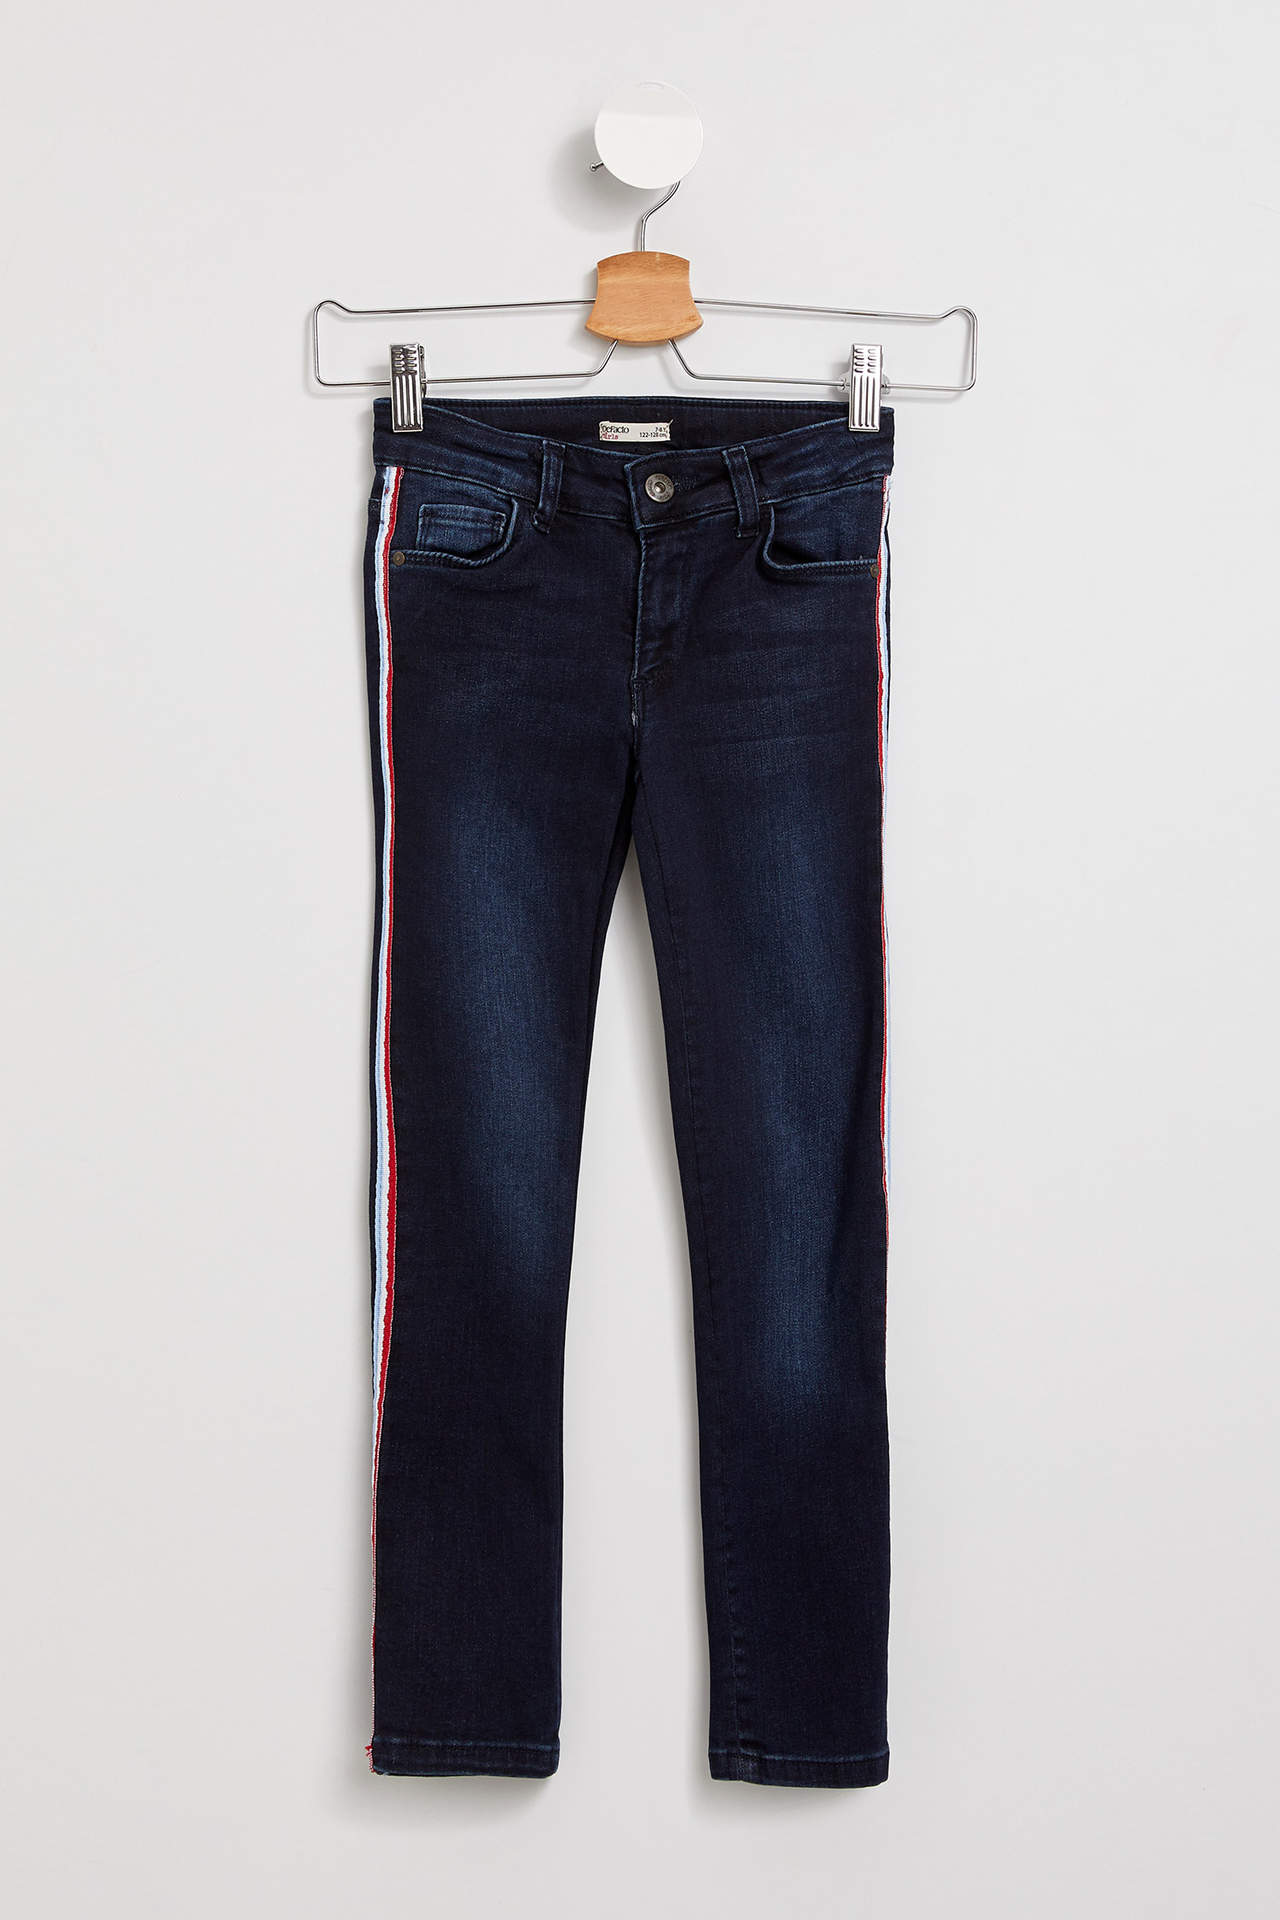 DeFacto Kız Çocuk Şerit Detaylı Jean Pantolon Mavi female